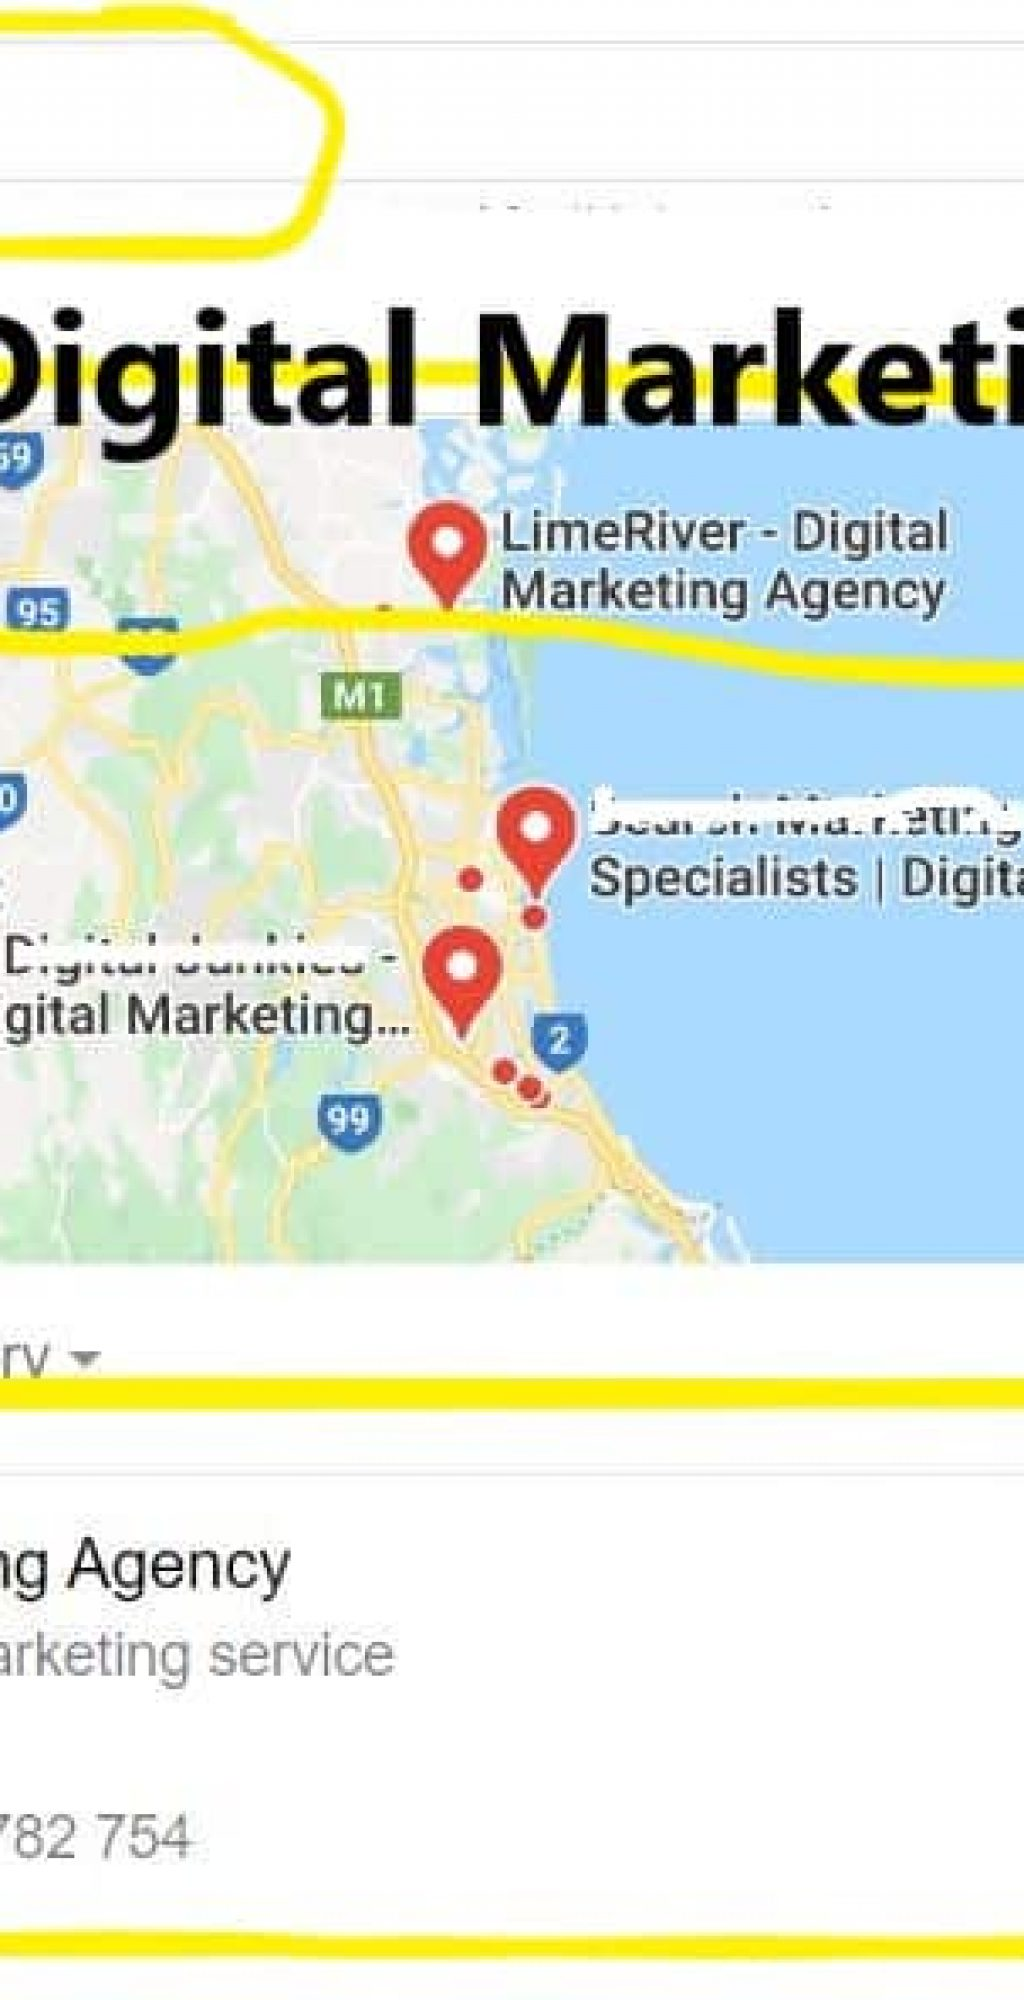 #1 Best Digital Marketing Services